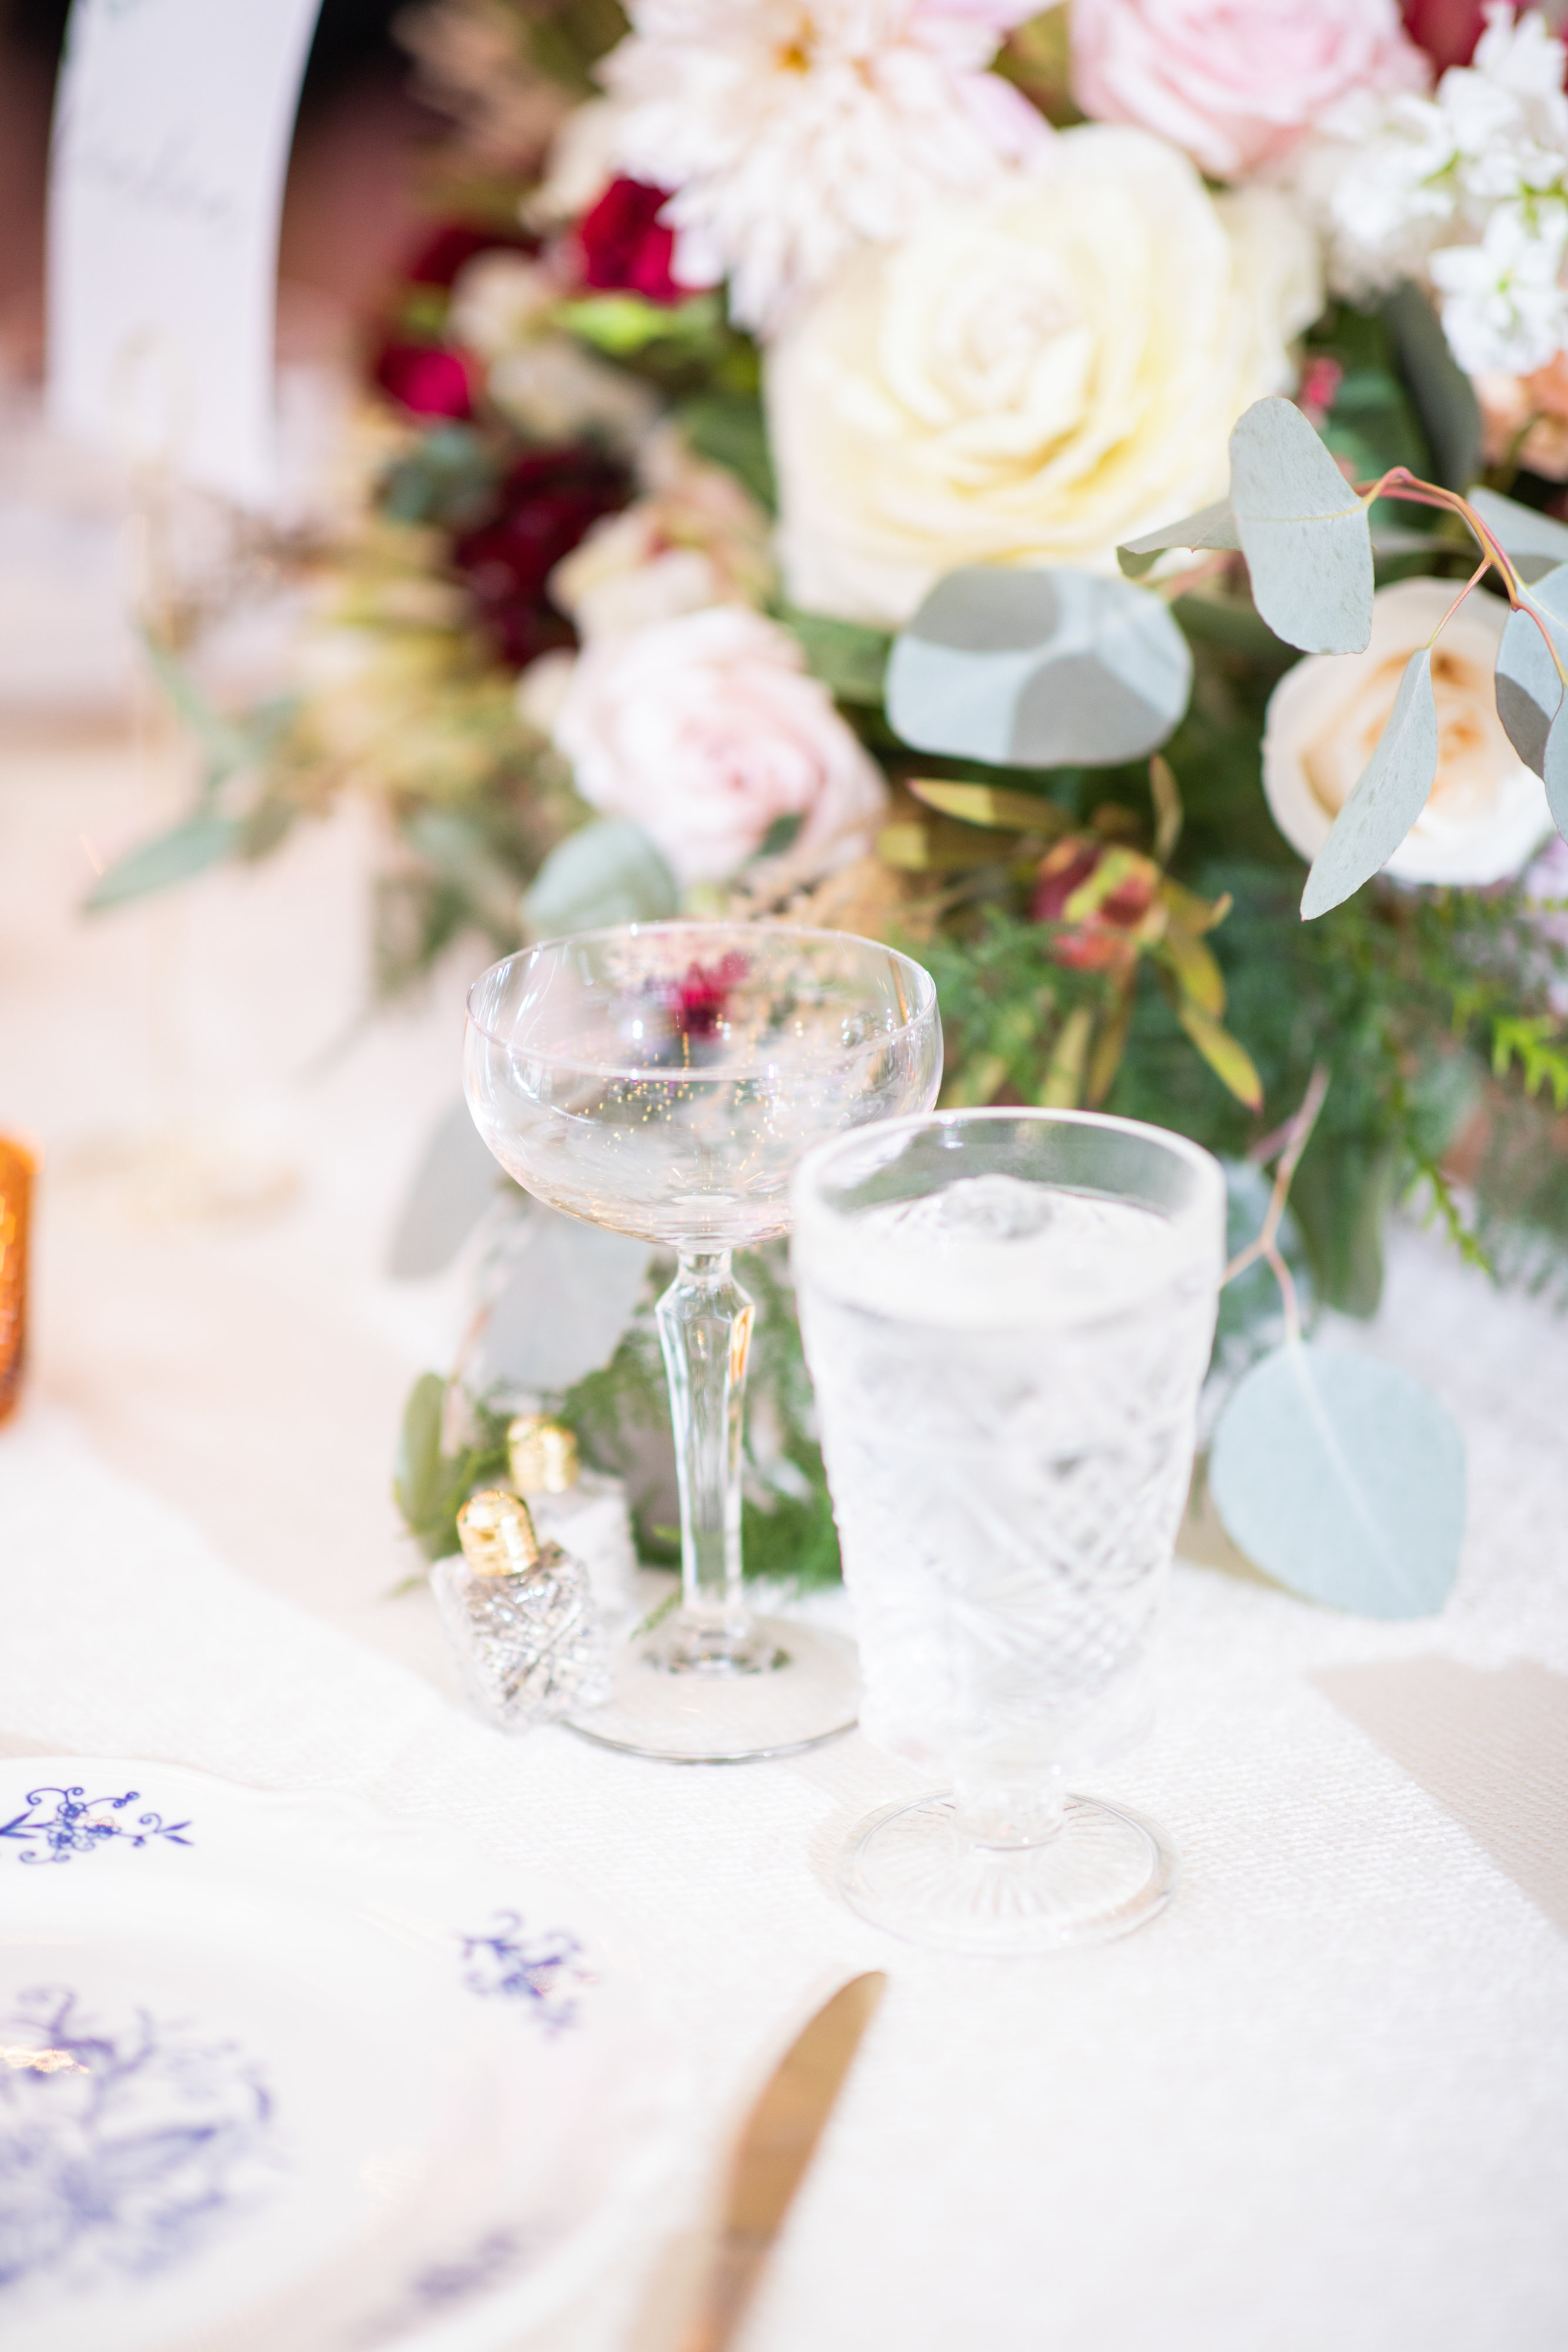 StefanieKamermanPhotography-MelanieandBenjamin-Wedding-Bethesda,MD-2019-10-12-363